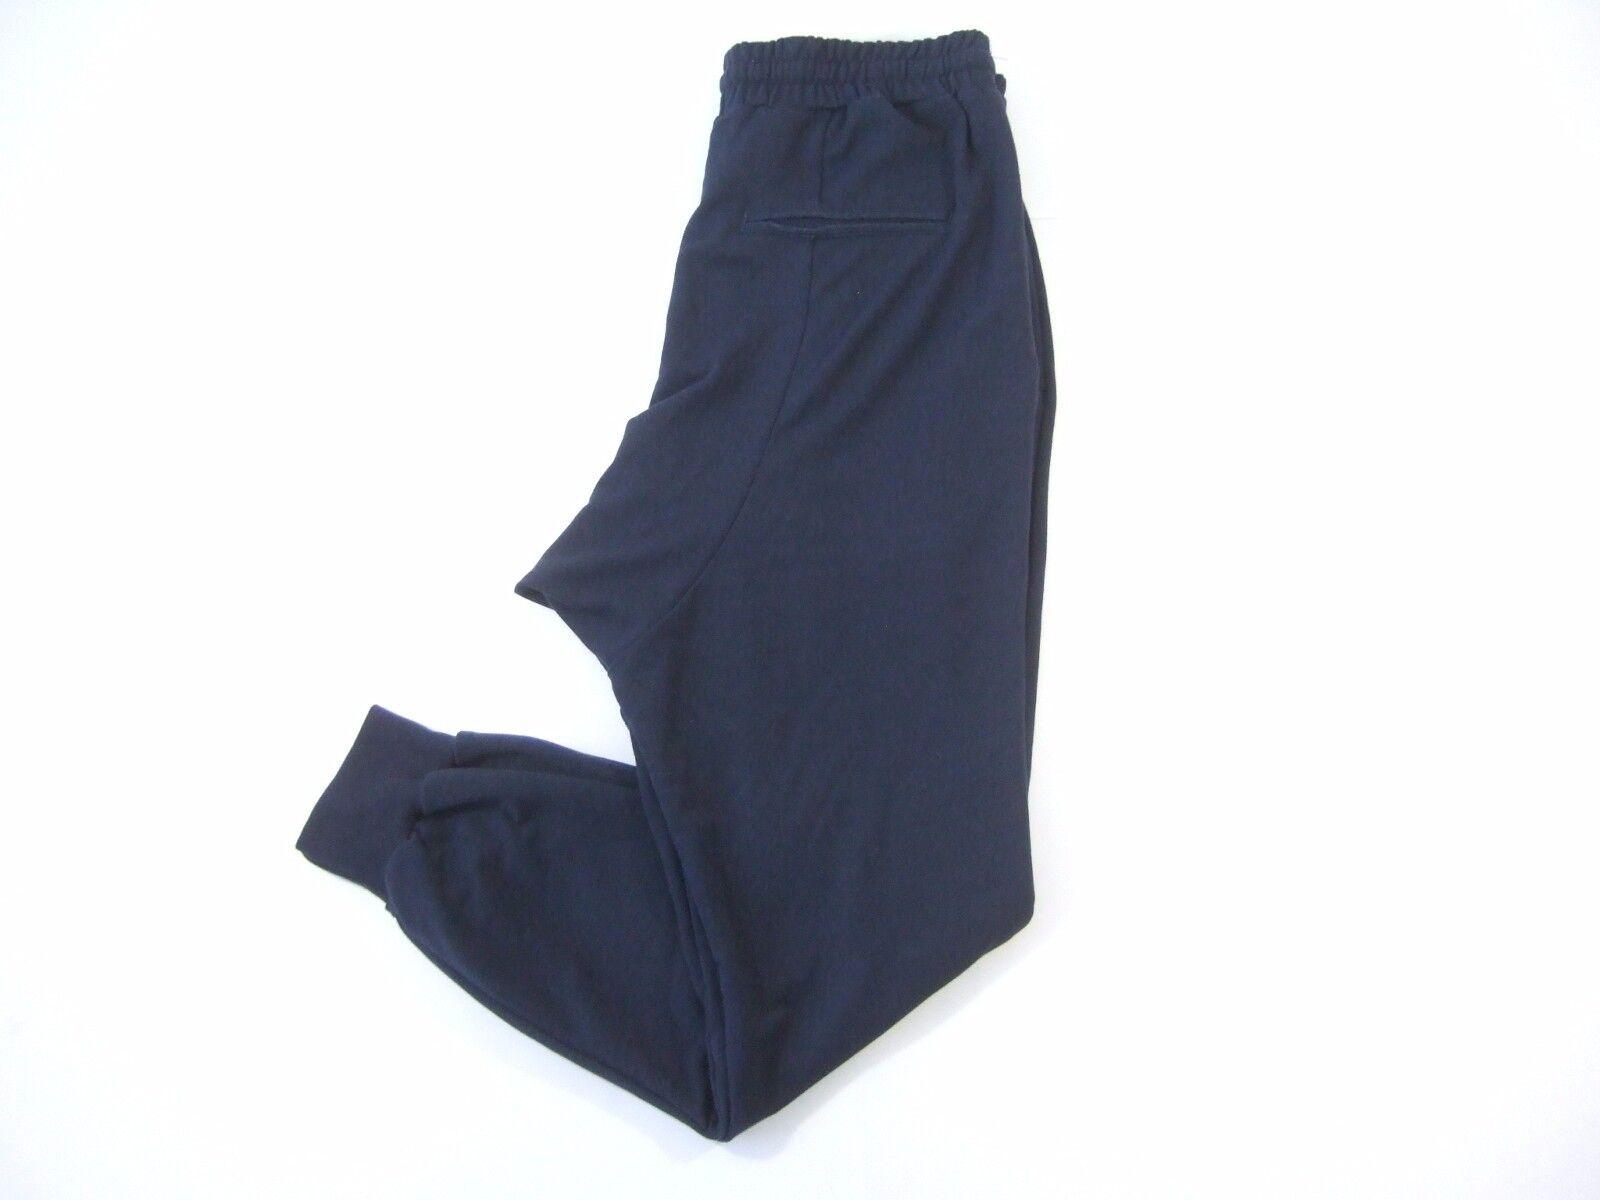 BLACK APPLE 4840 NAVY BLUE SMALL JOGGER JOG SWEAT PANTS MENS NWT NEW